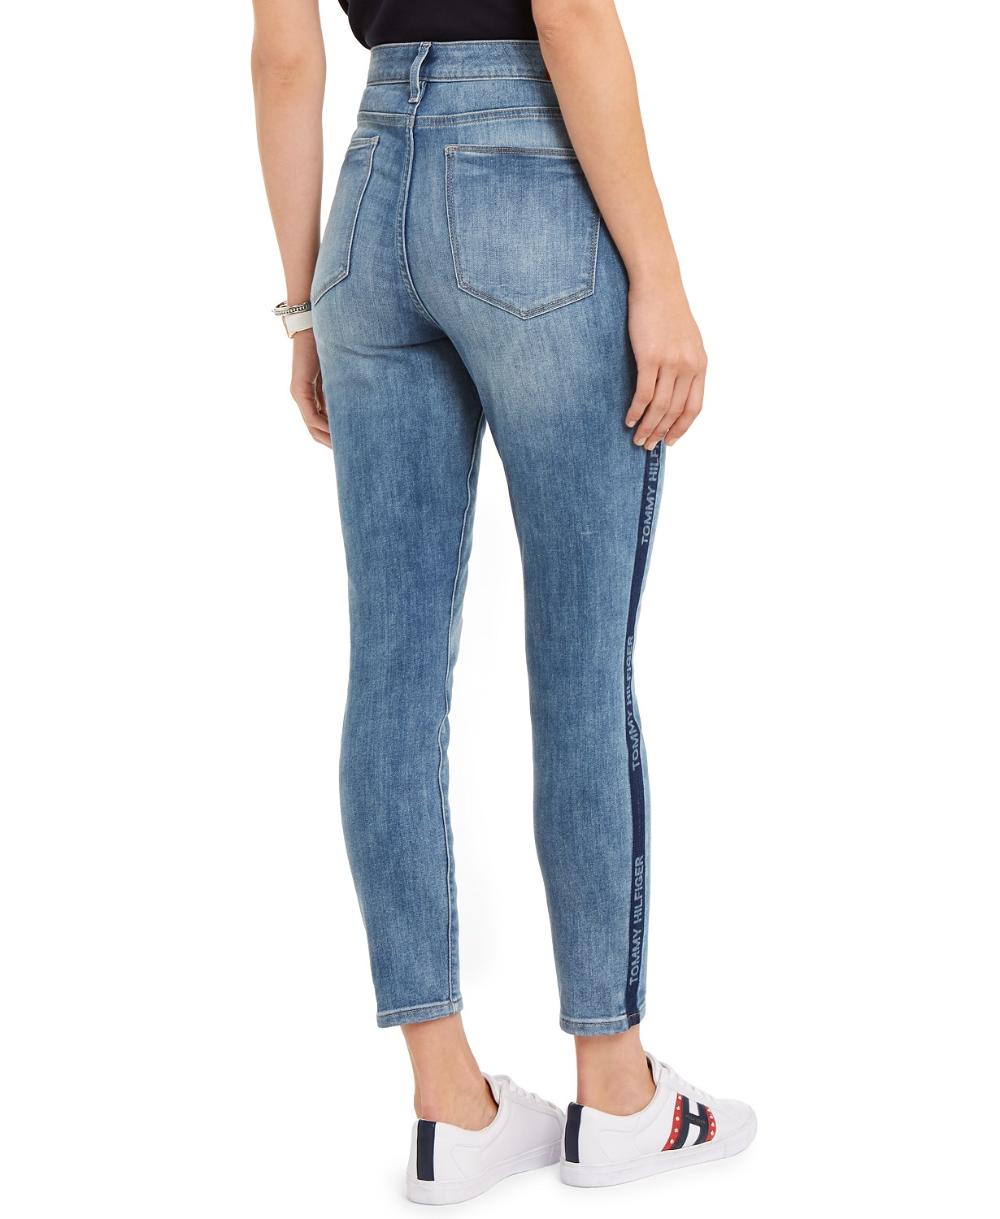 aislamiento Durante ~ Salón  Tommy Hilfiger Logo-Striped Skinny Jeans, Created For Macy's & Reviews -  Jeans - Women - Macy's   Women jeans, Tommy hilfiger, Skinny jeans